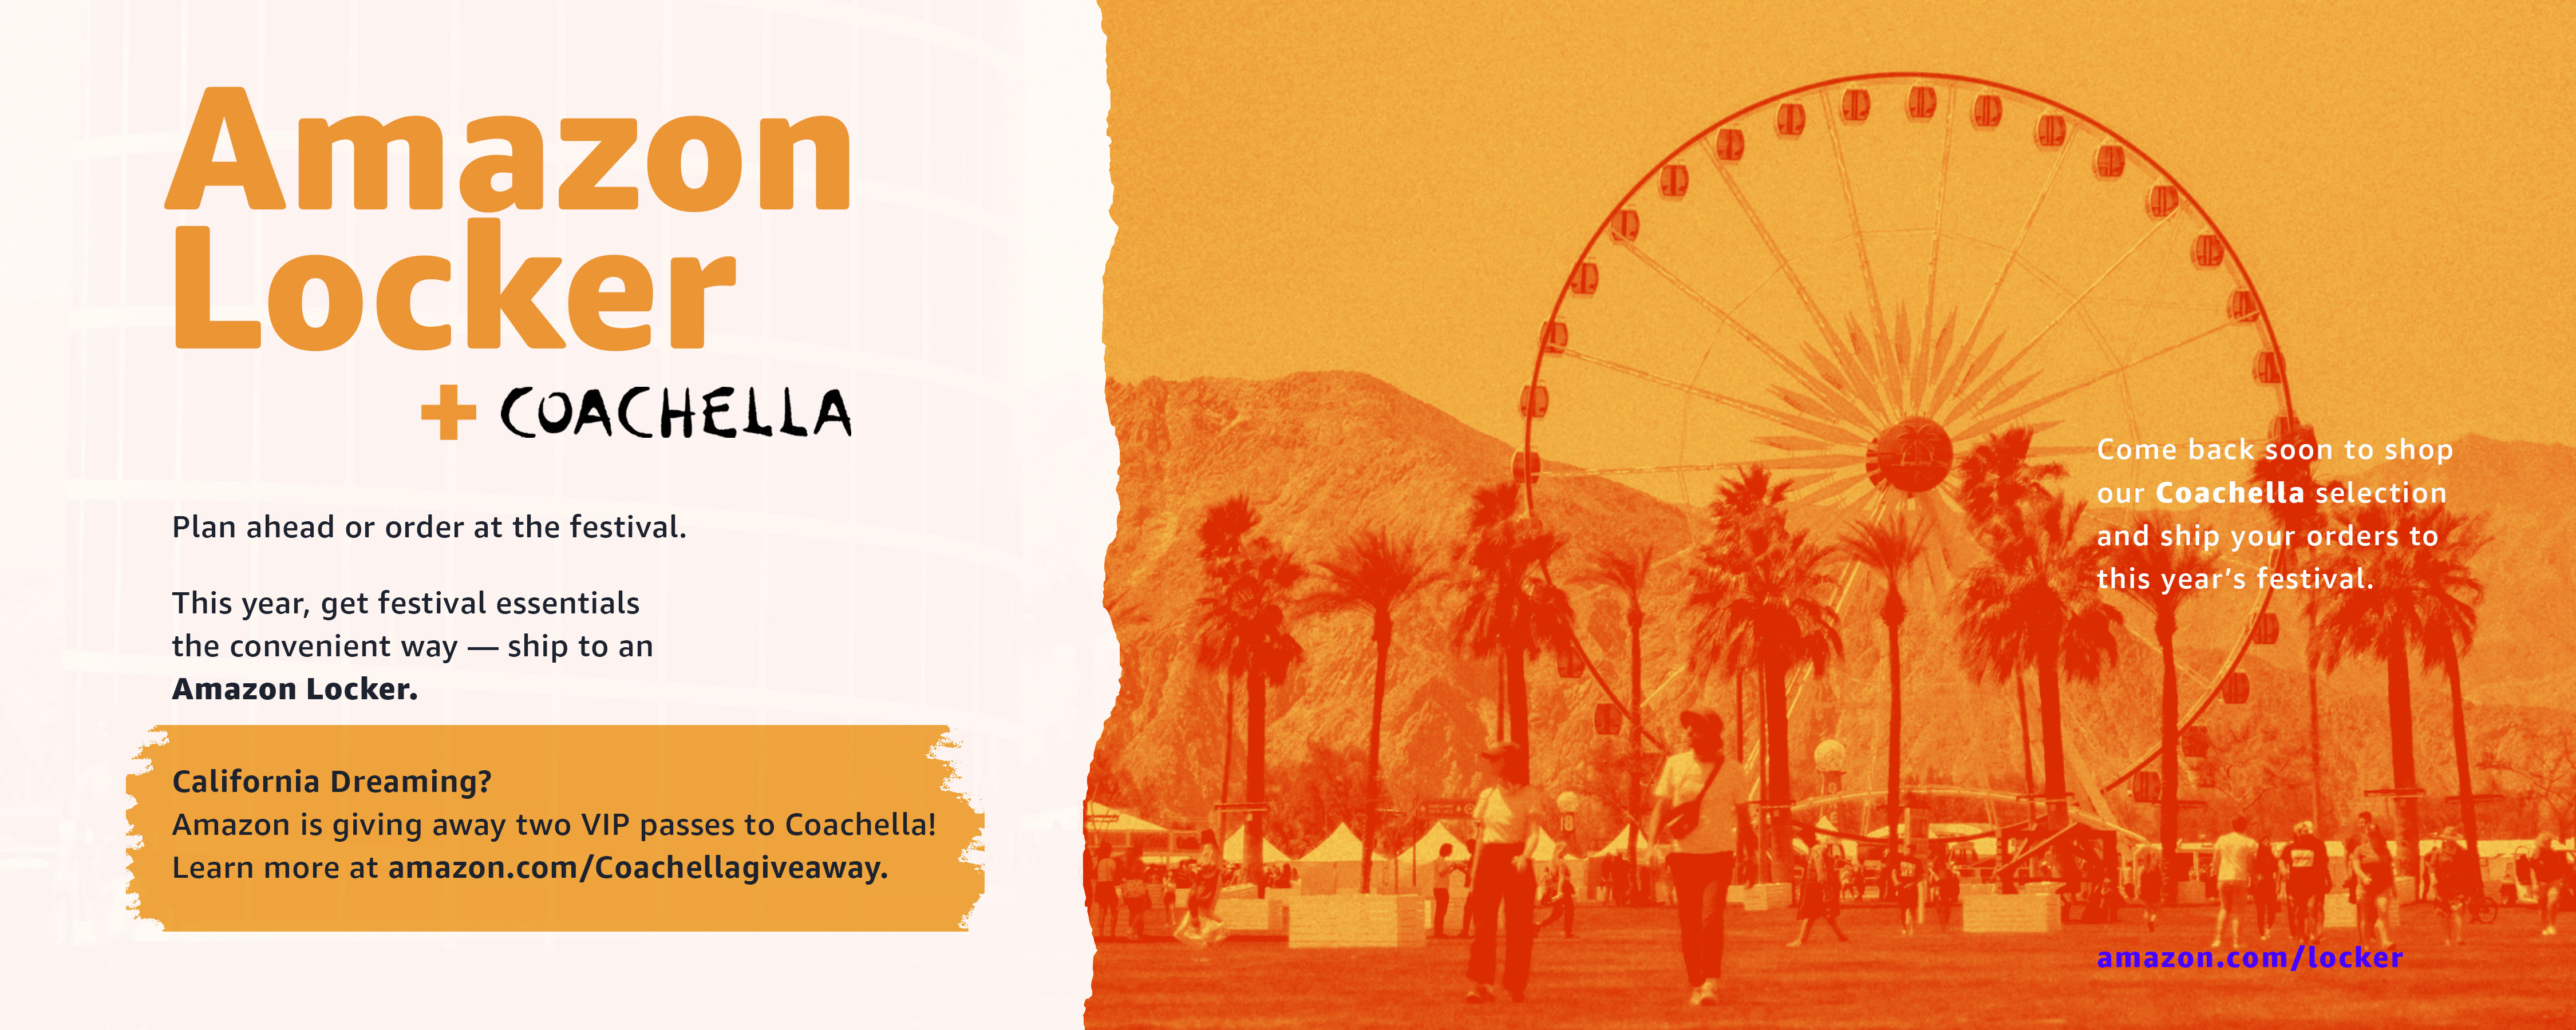 Amazon Locker + Coachella